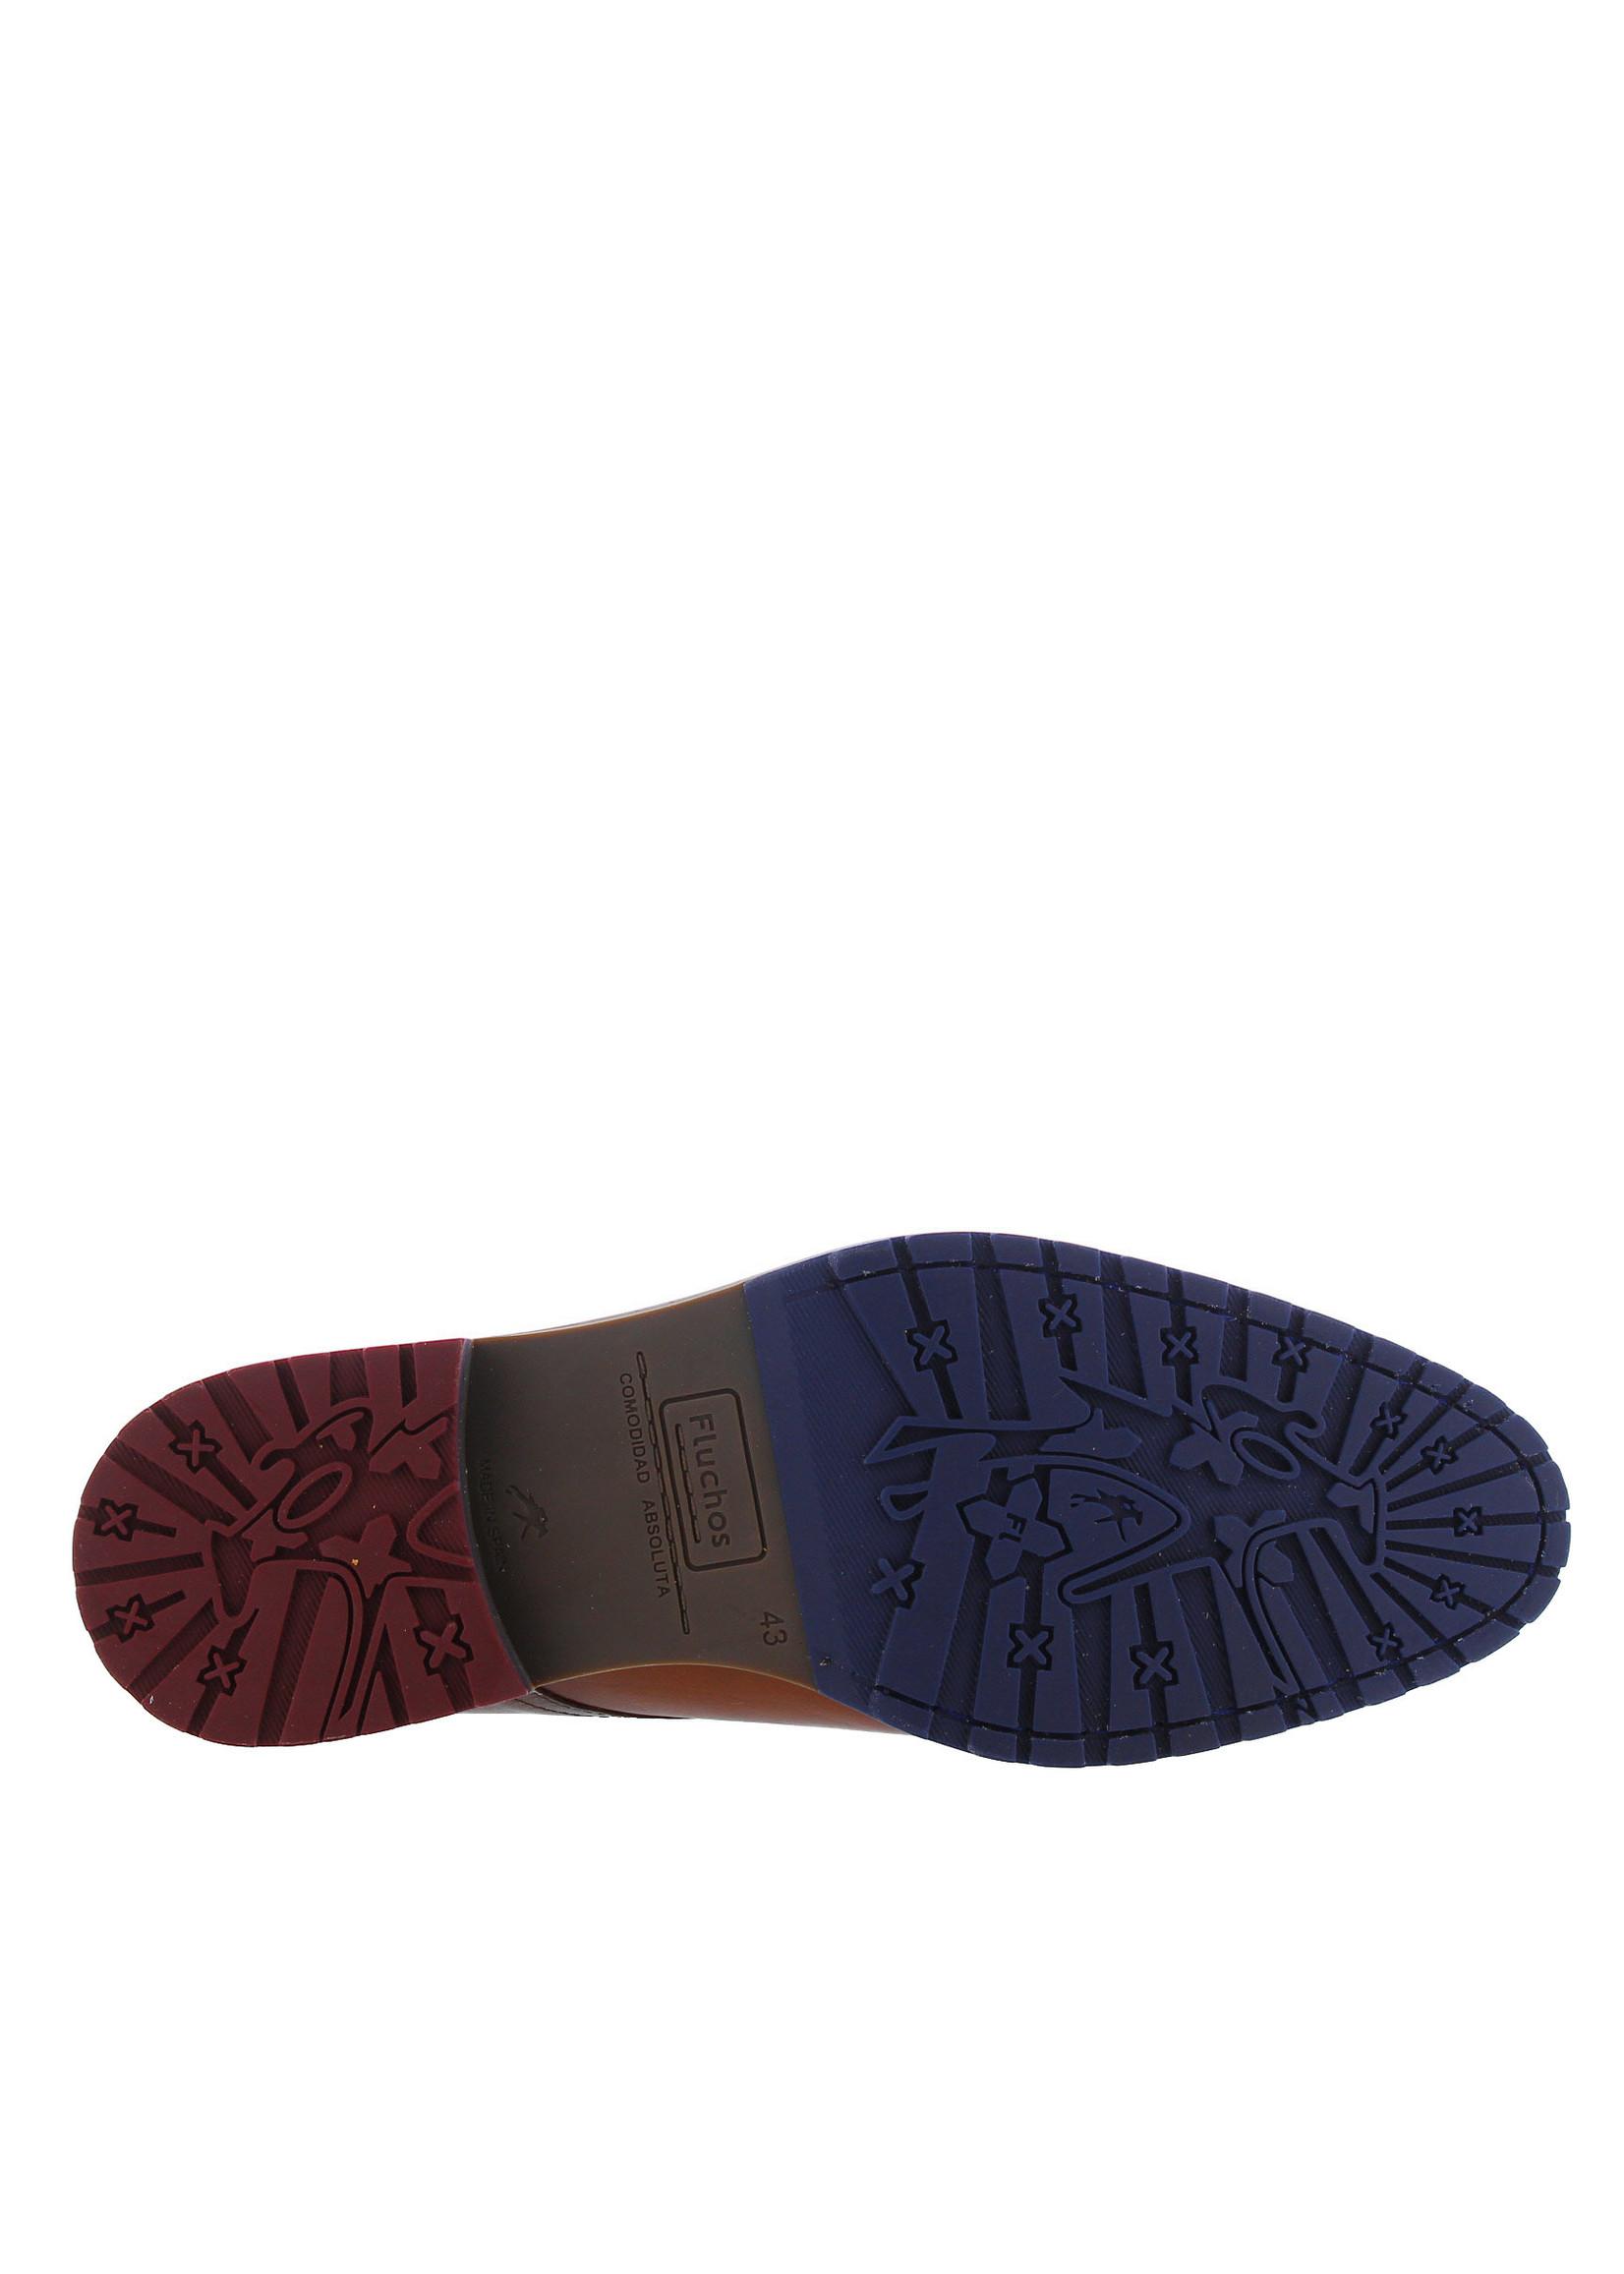 Fluchos 32641 F0273 Fluchos Dress Shoe